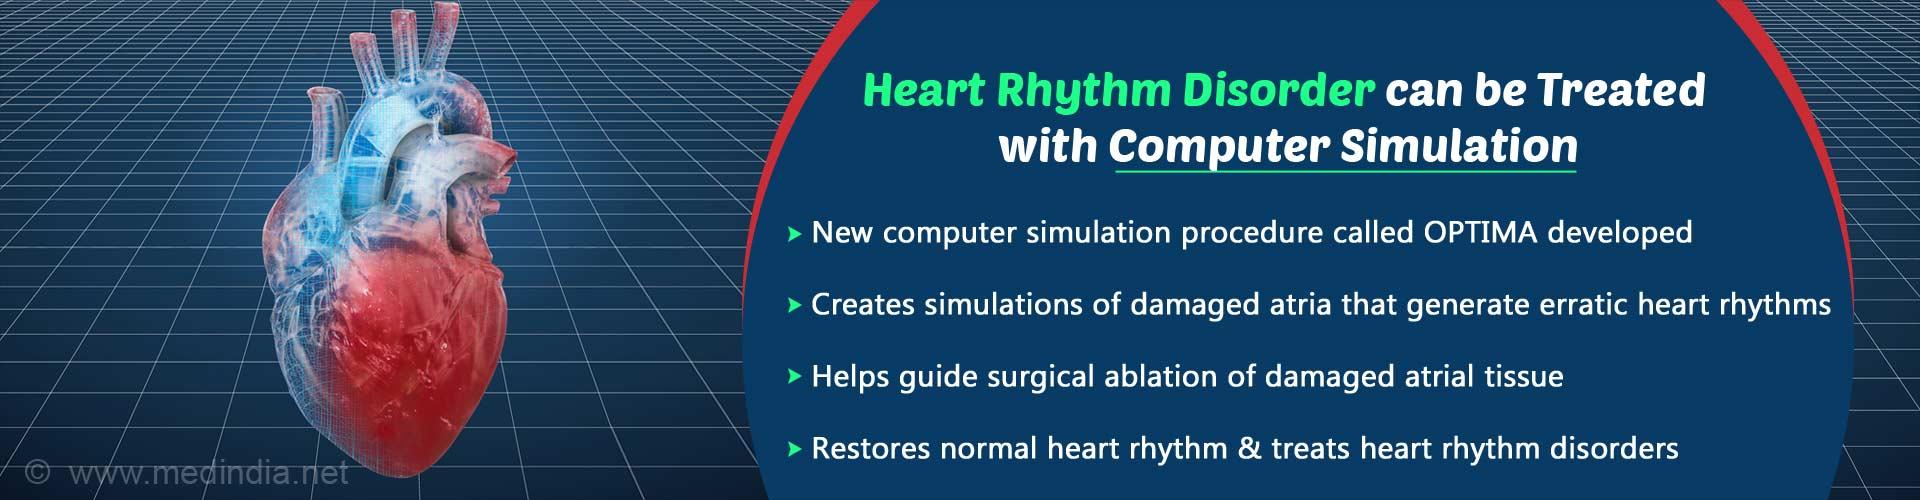 New Procedure Helps Treat Most Common Heart Rhythm Disorder